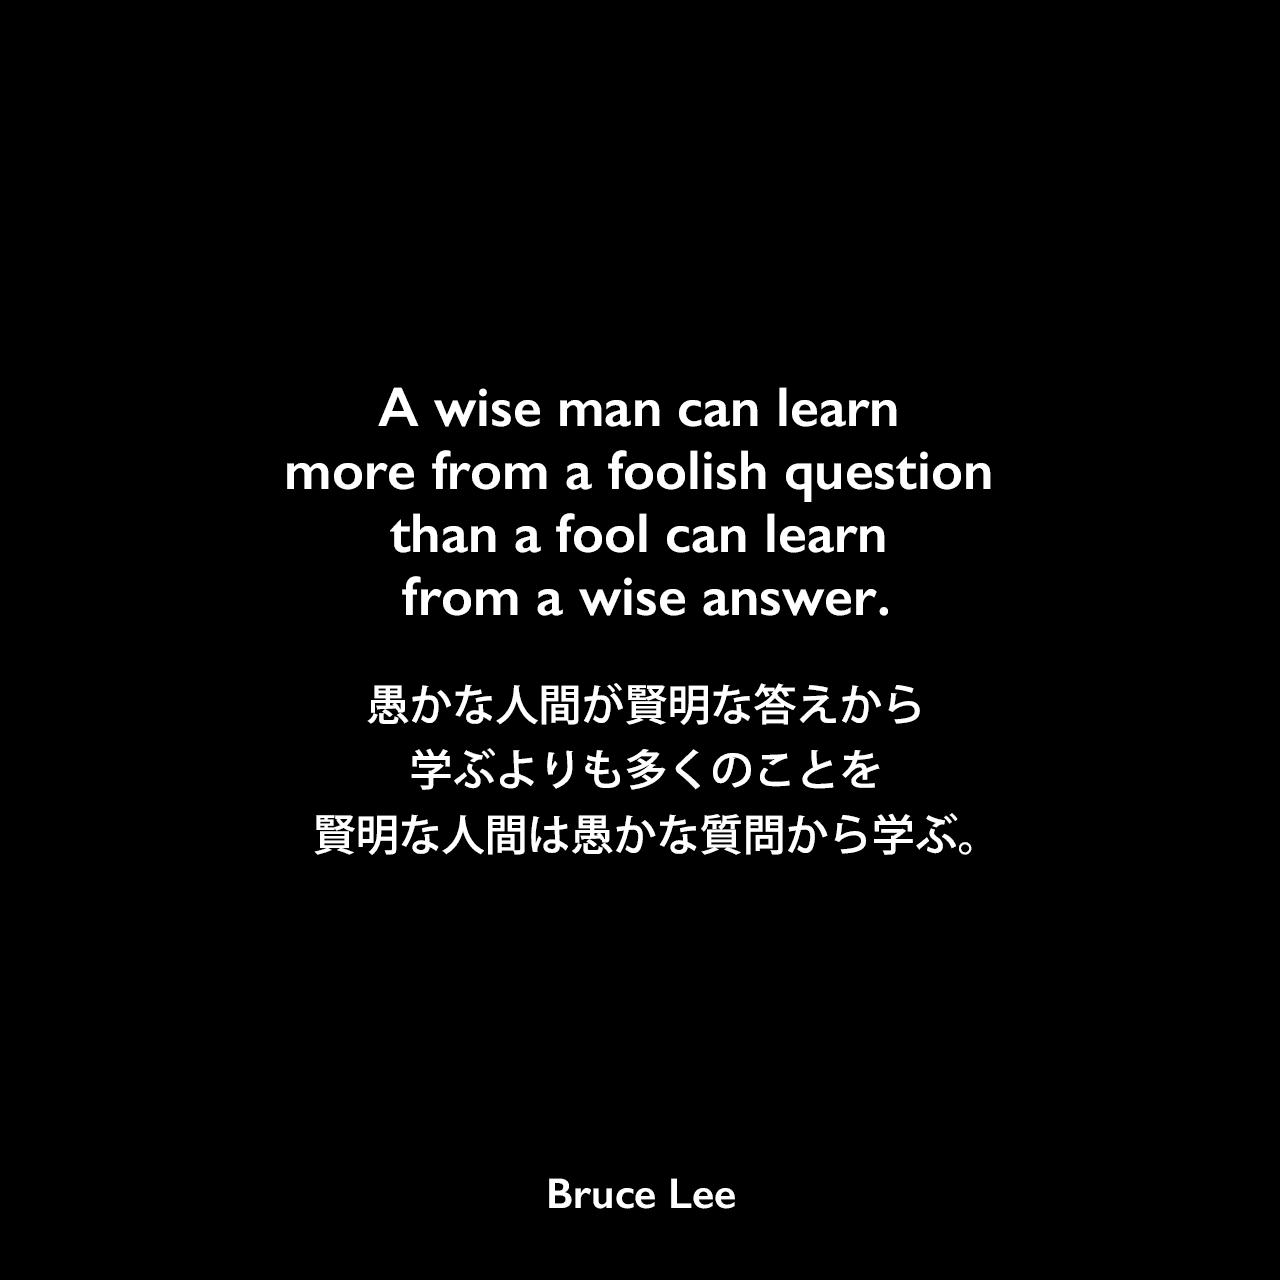 A wise man can learn more from a foolish question than a fool can learn from a wise answer.愚かな人間が賢明な答えから学ぶよりも多くのことを、賢明な人間は愚かな質問から学ぶ。Bruce Lee